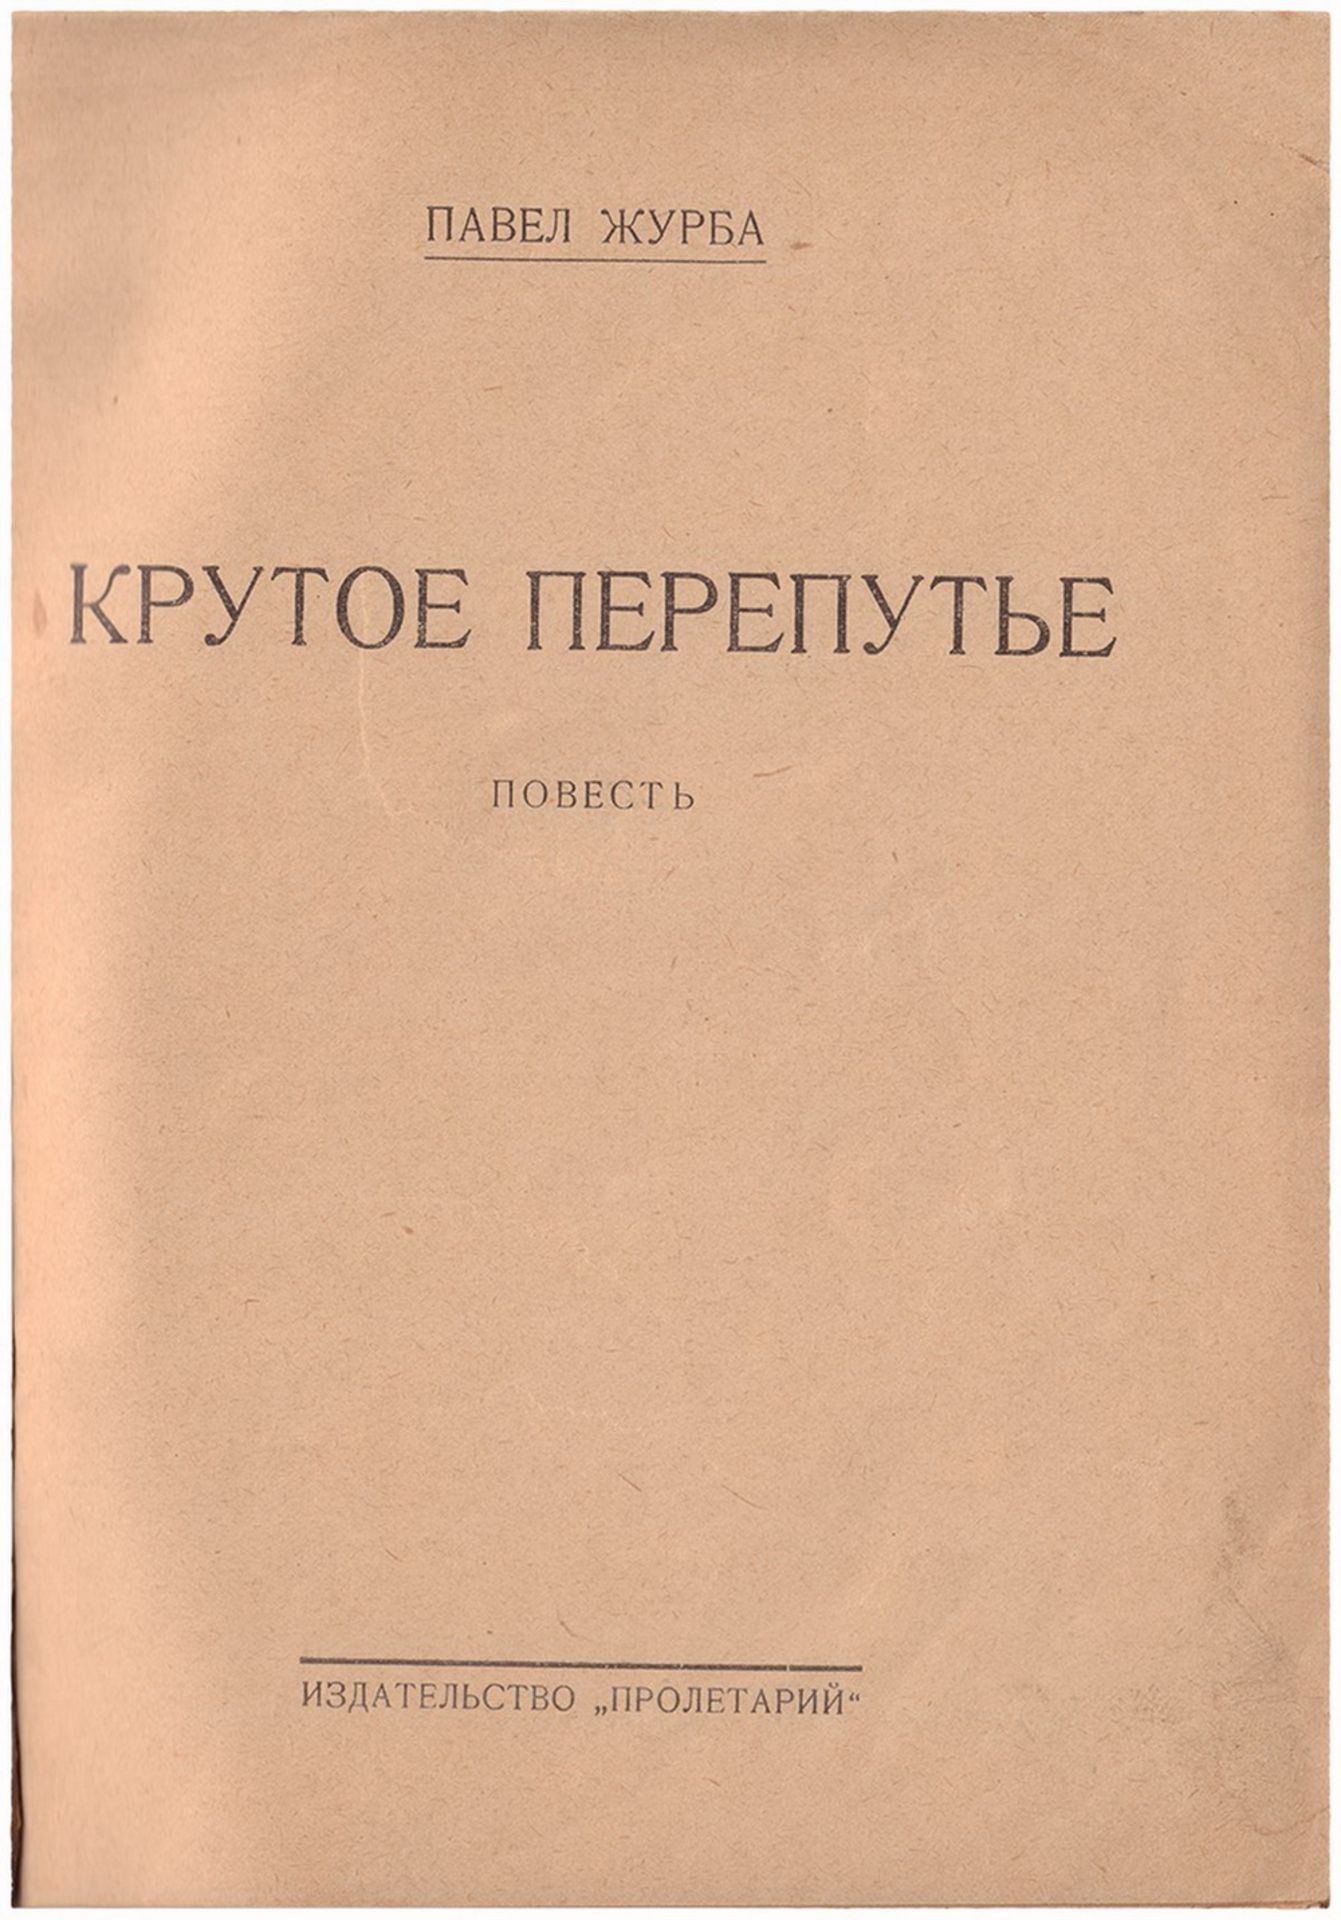 [Original printer's dummy of cover by Adolf Strakhov and the book. Soviet art]. Zhurba, P. Rapid cro - Bild 3 aus 3